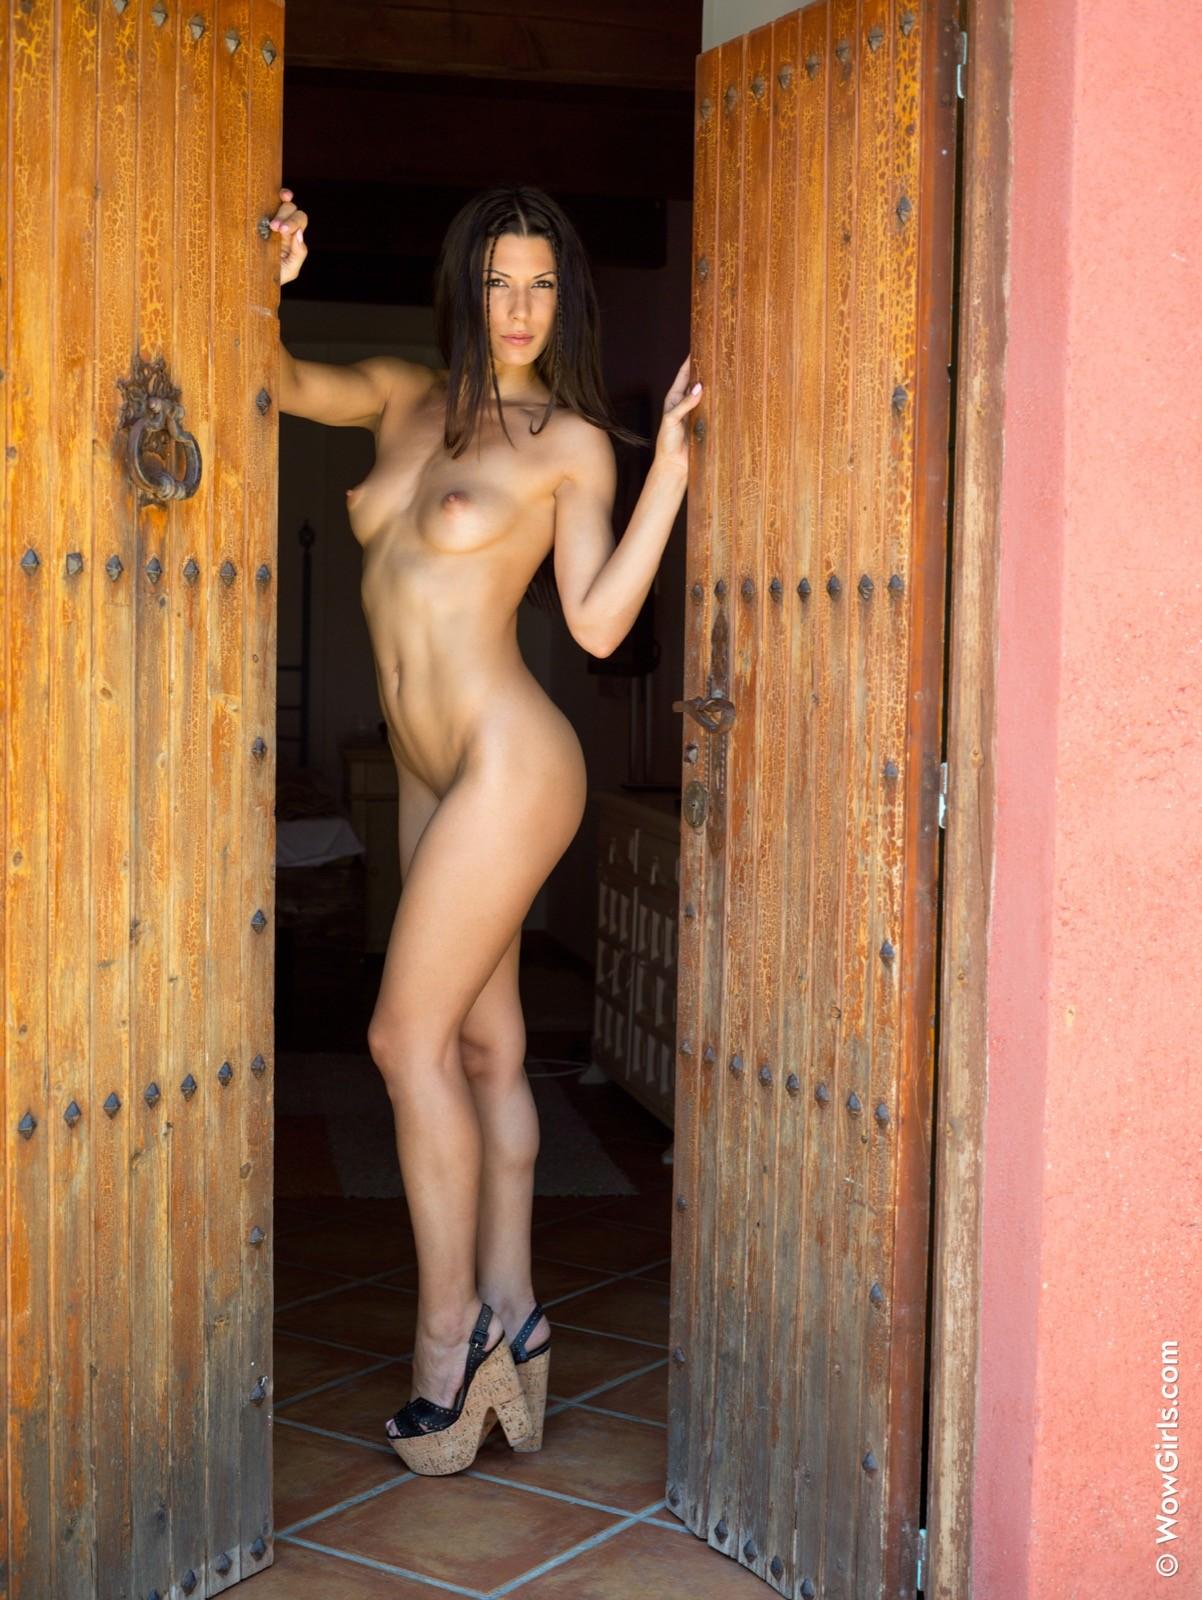 Брюнетка без трусов села на пол - фото